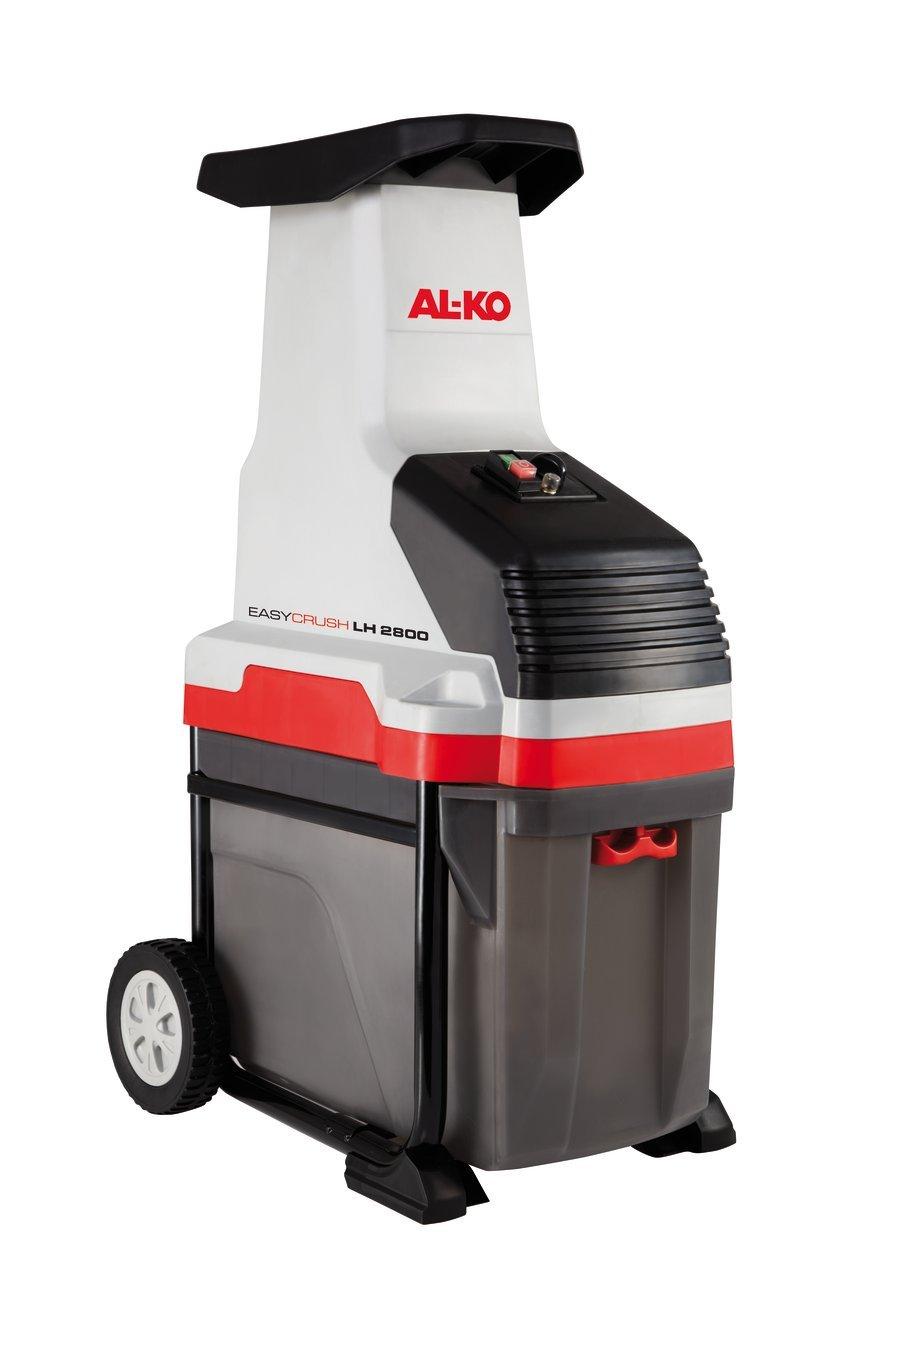 AL-KO Easy Crush 2800